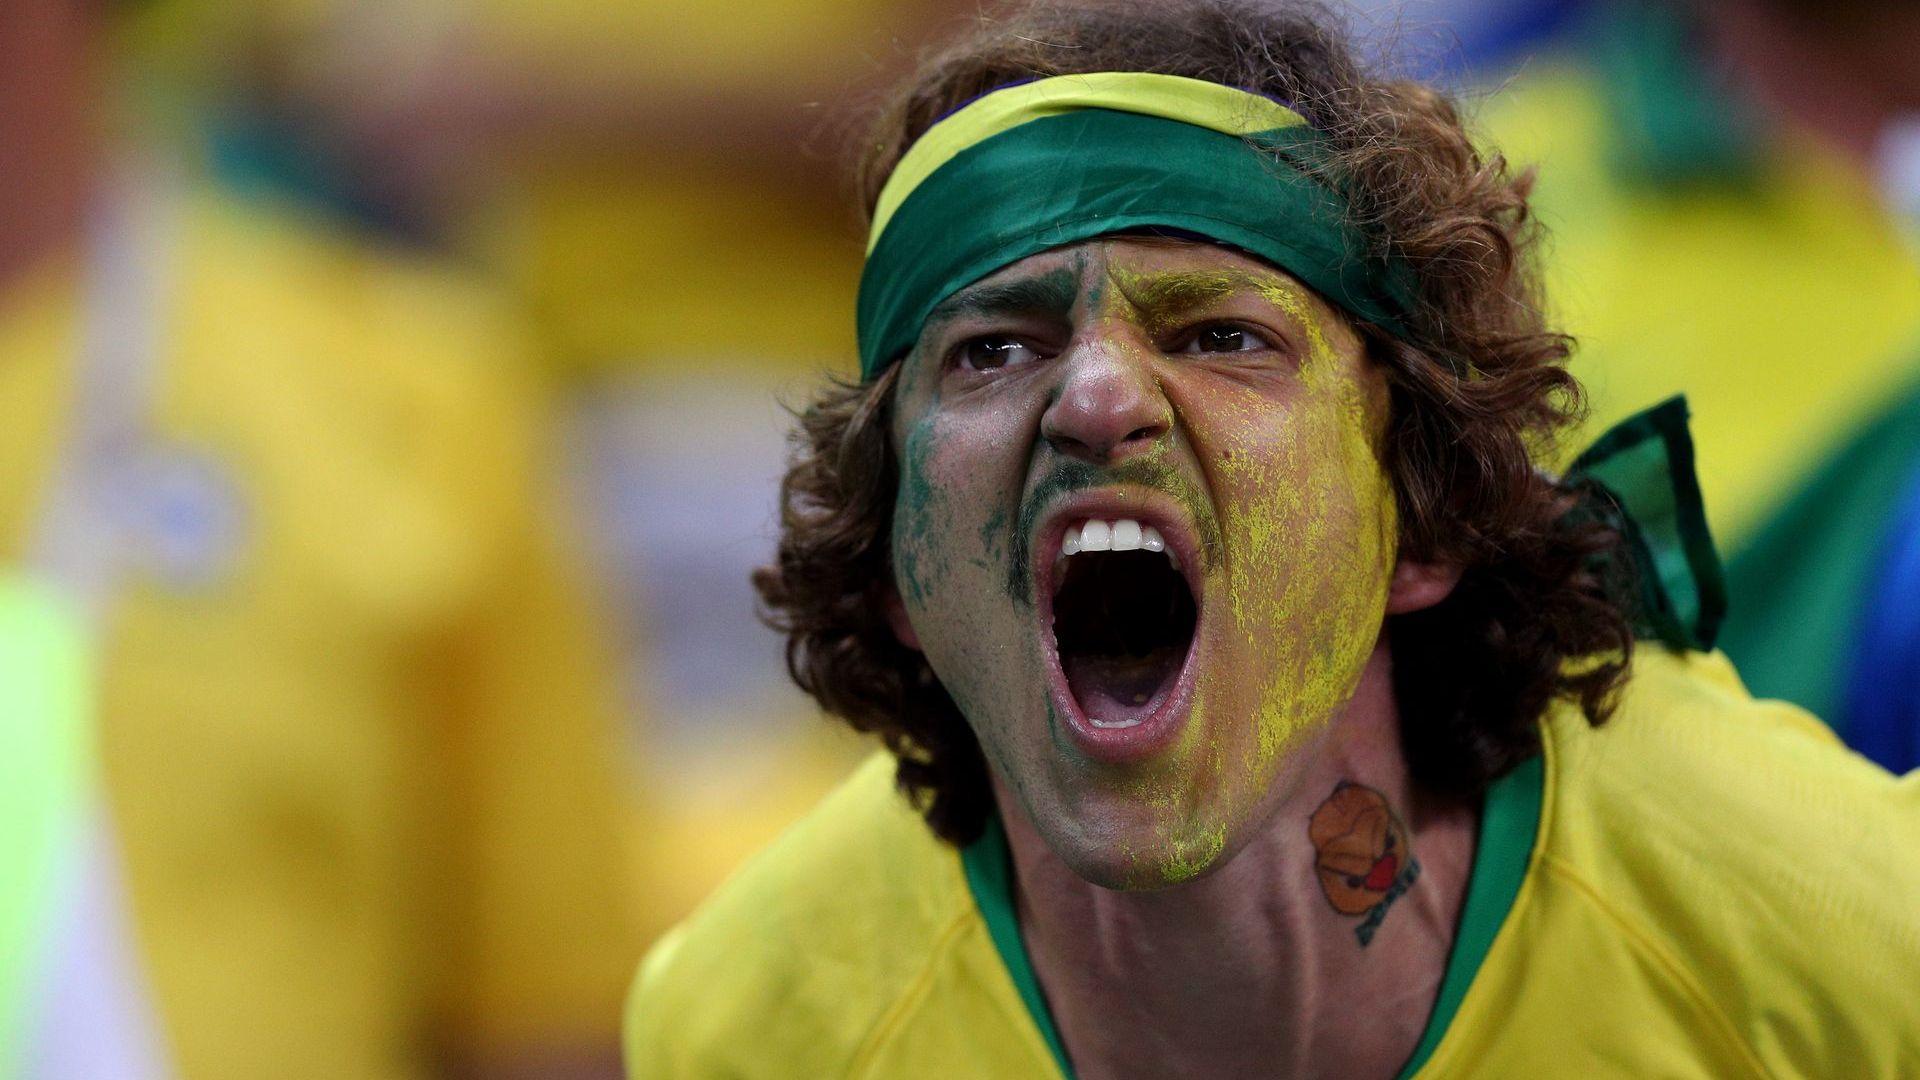 Така посрещат Бразилия след провала на Мондиала (видео)